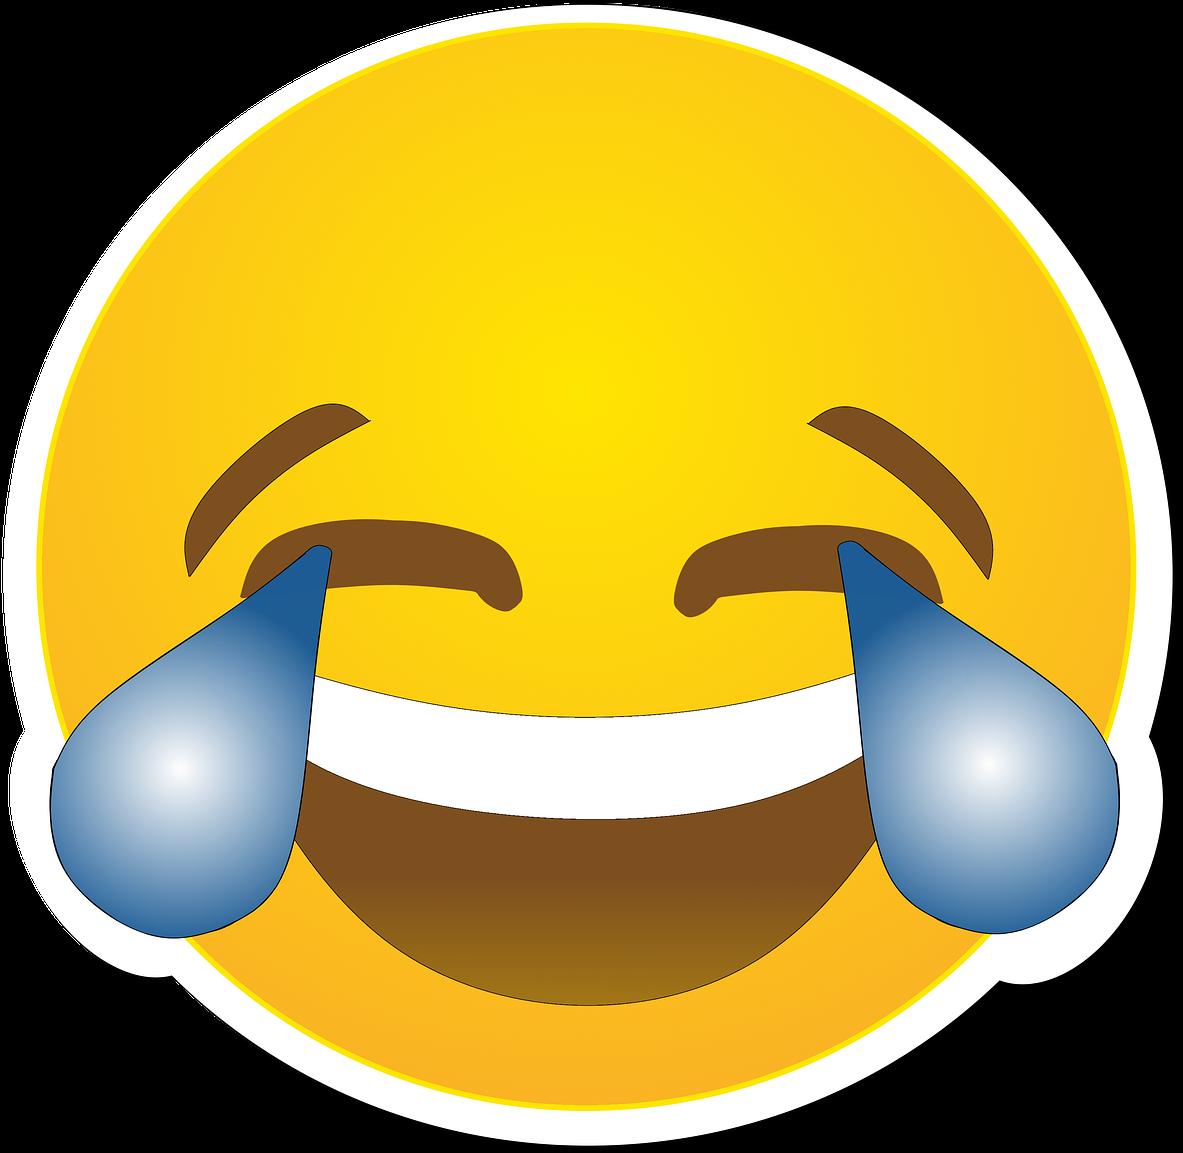 Funny Laughing Face Cartoon 2, Buy Clip Art - Emoji De ...